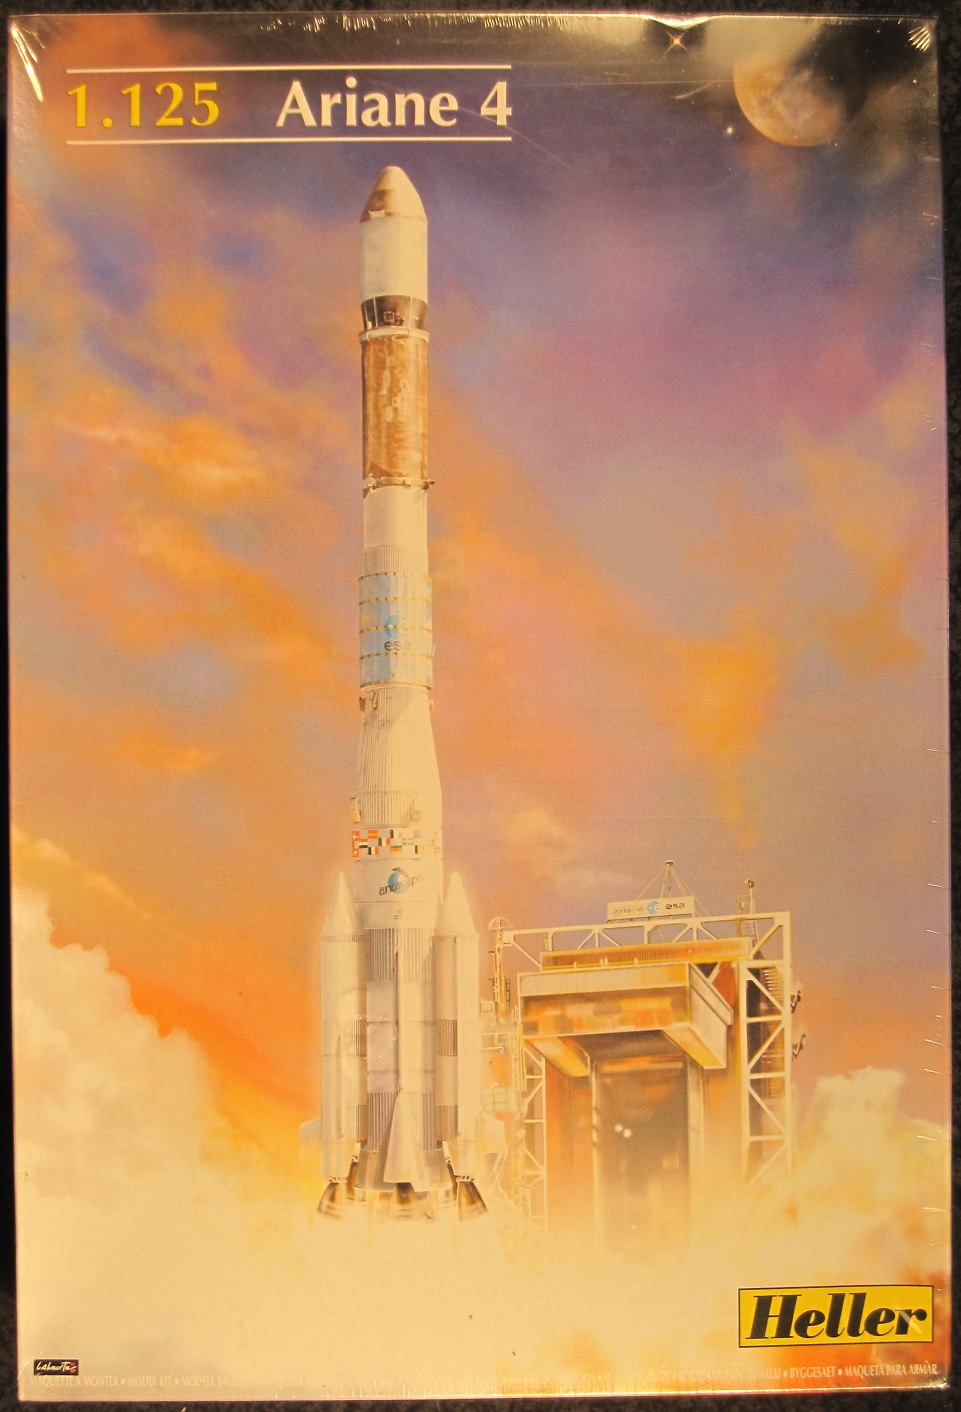 Heller European Space Agency 1 125 Scale Ariane 4 Rocket